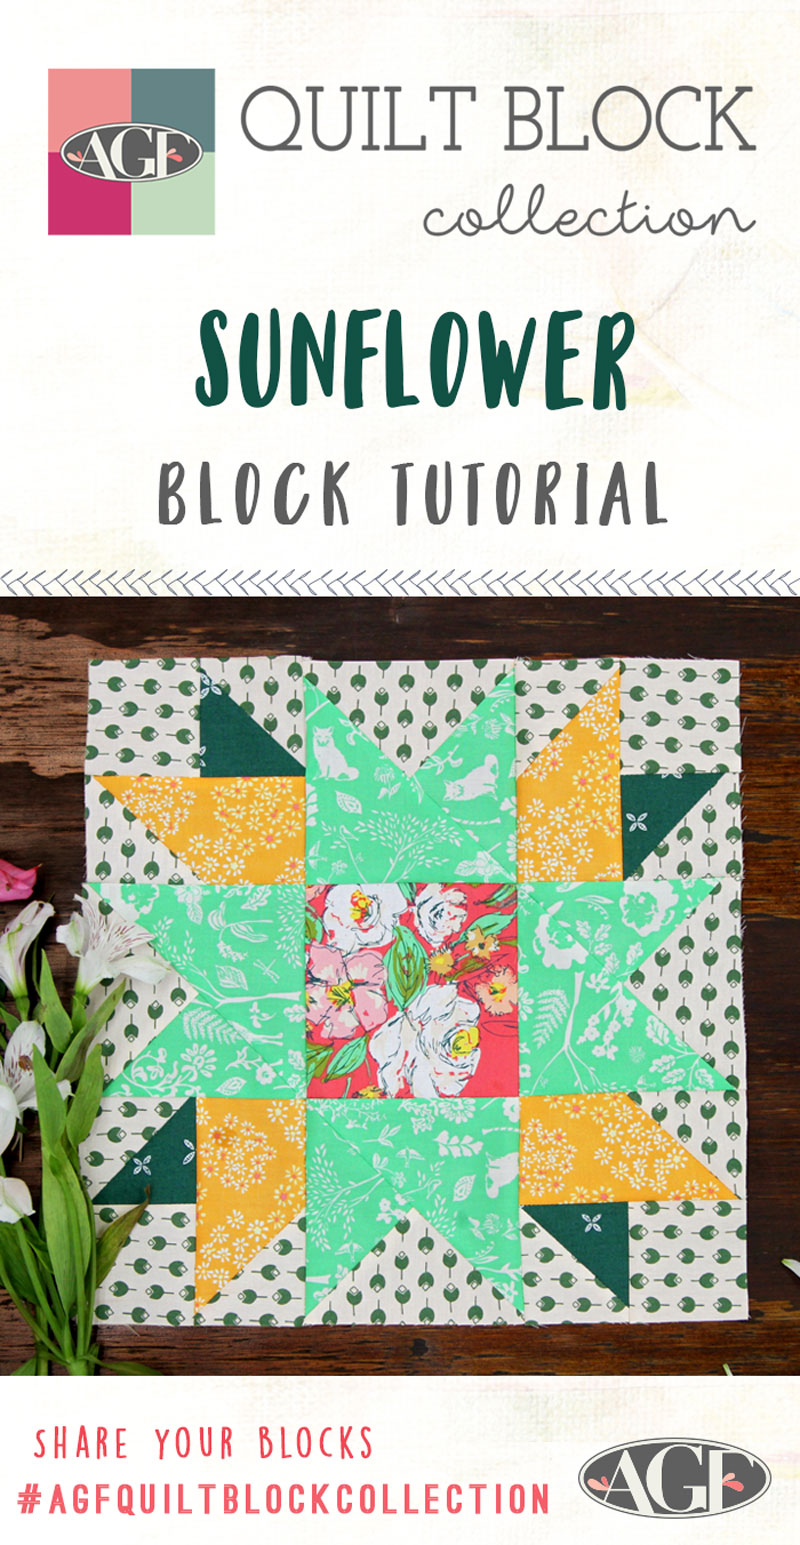 Sunflower-Block-Tutorial